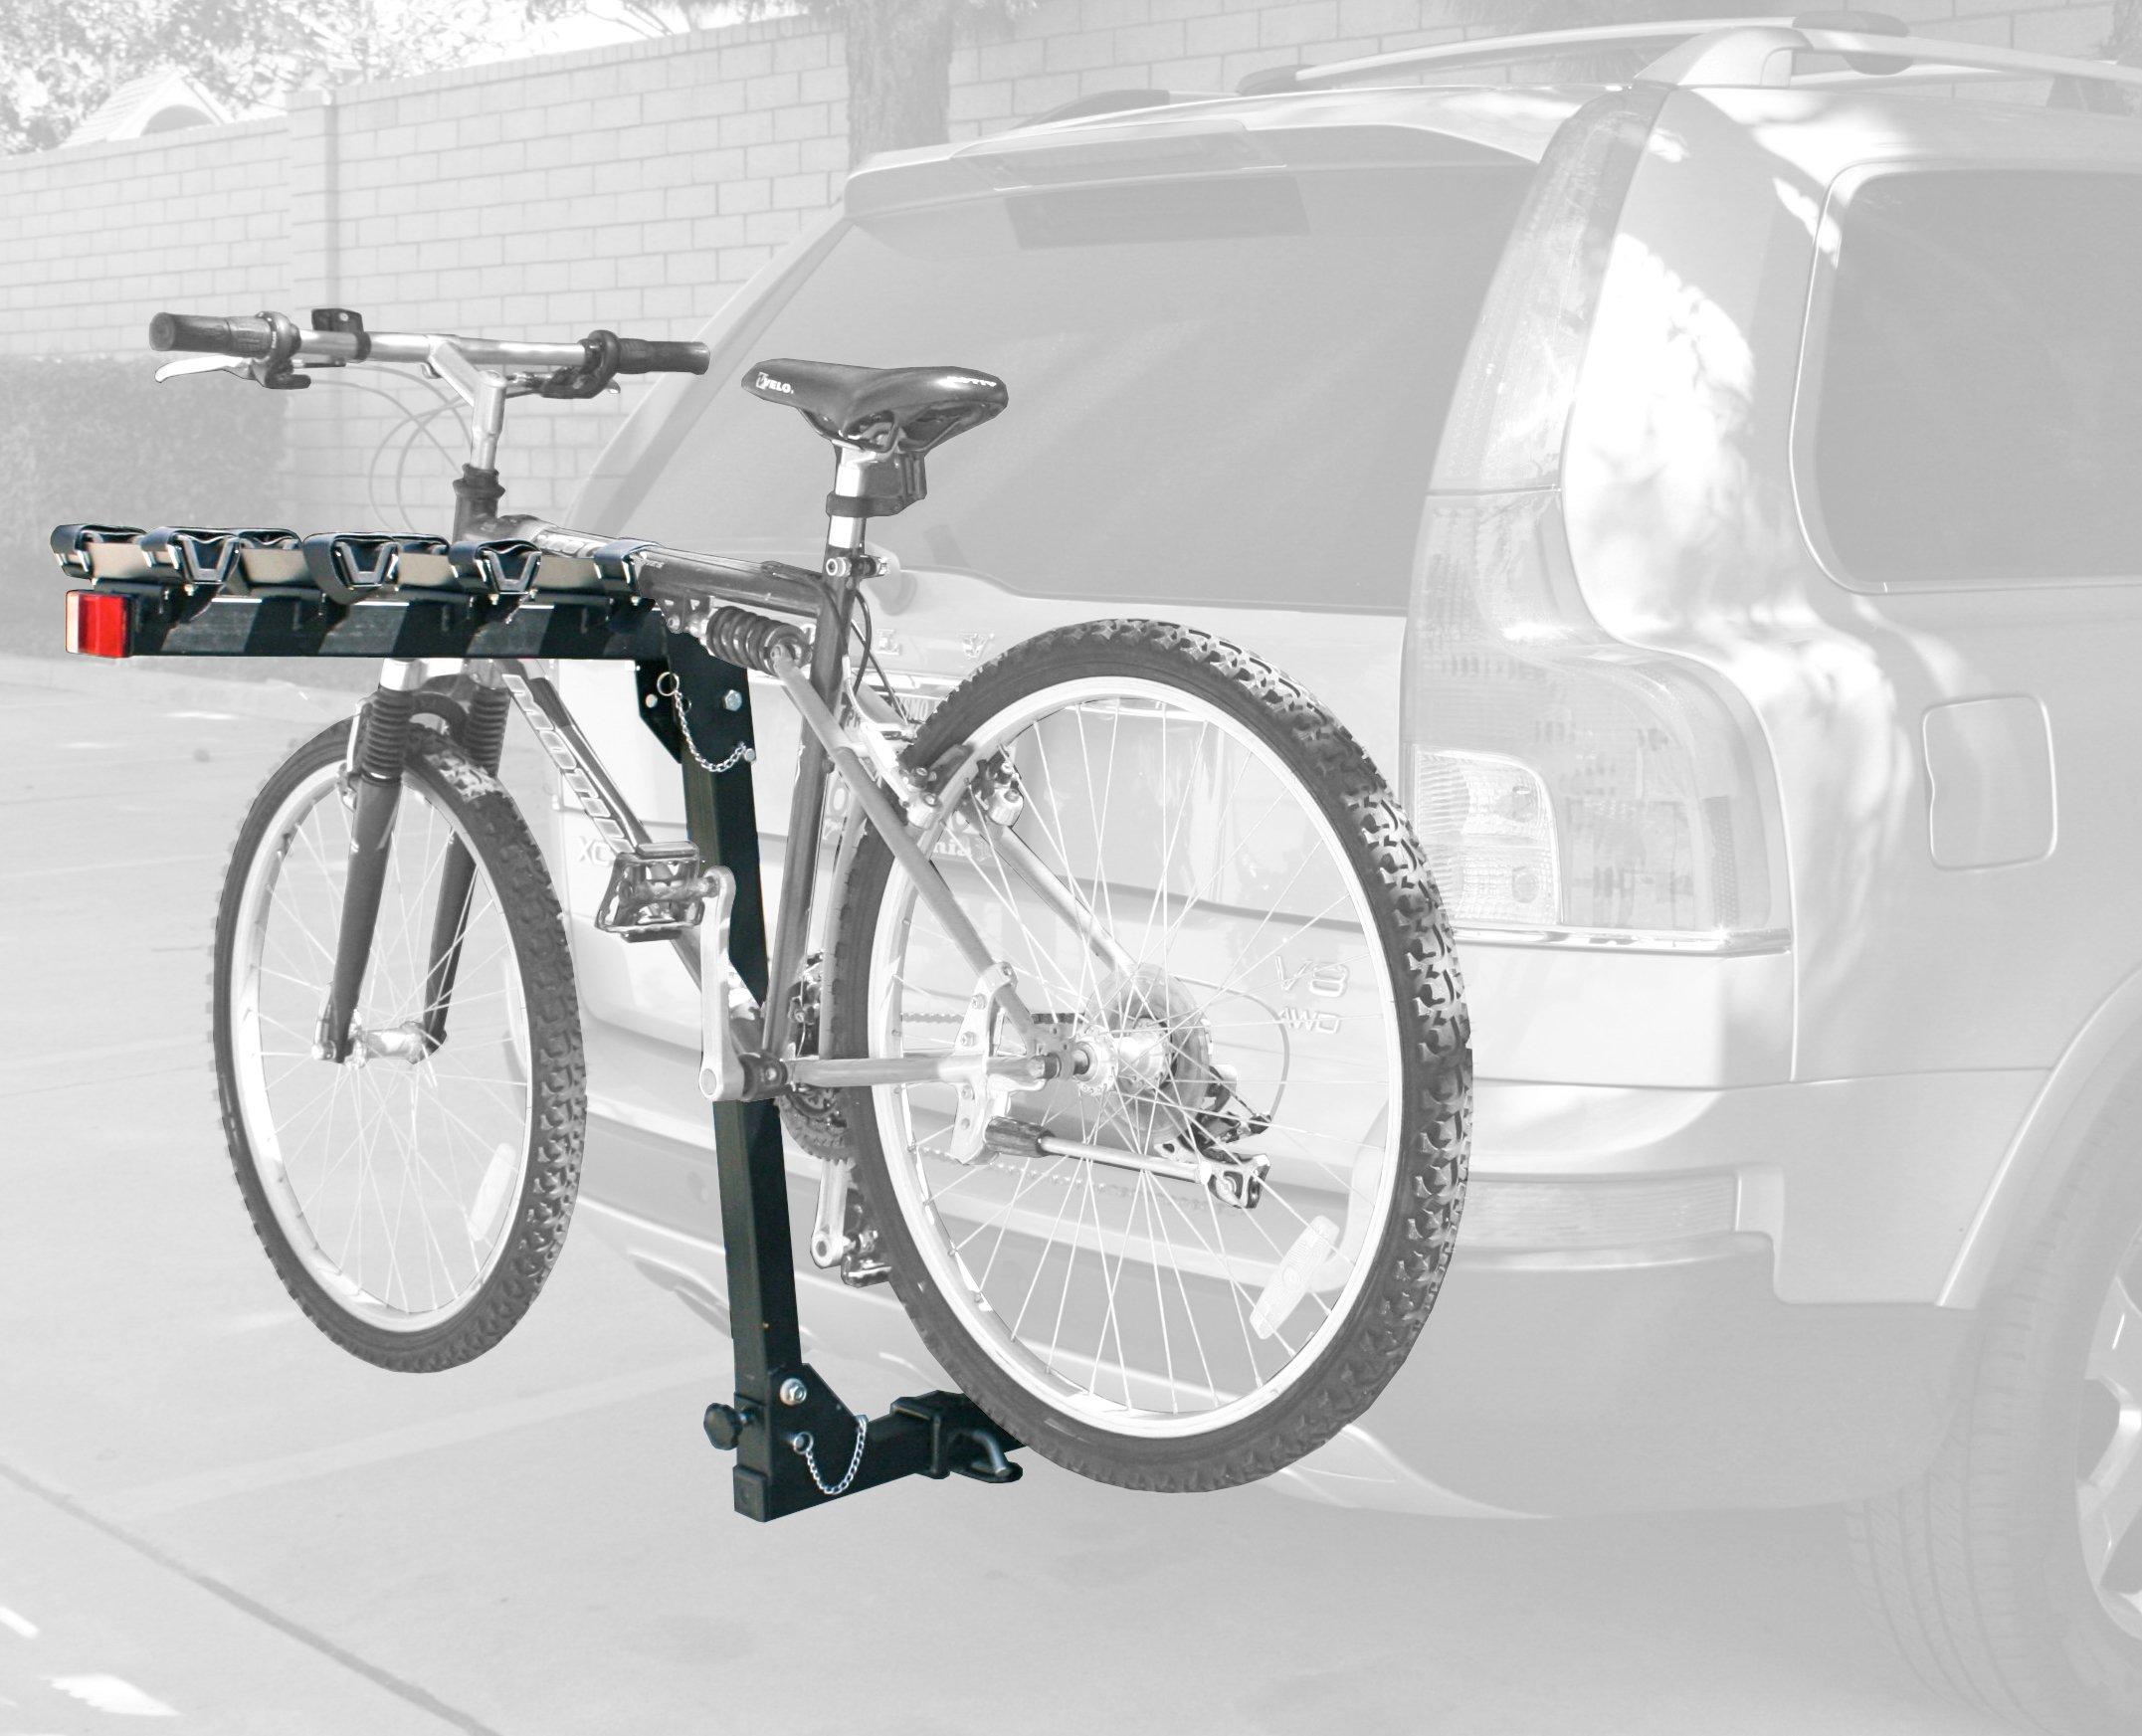 MaxxHaul (70210) 4-Bike Deluxe Hitch Mount Rack by MaxxHaul